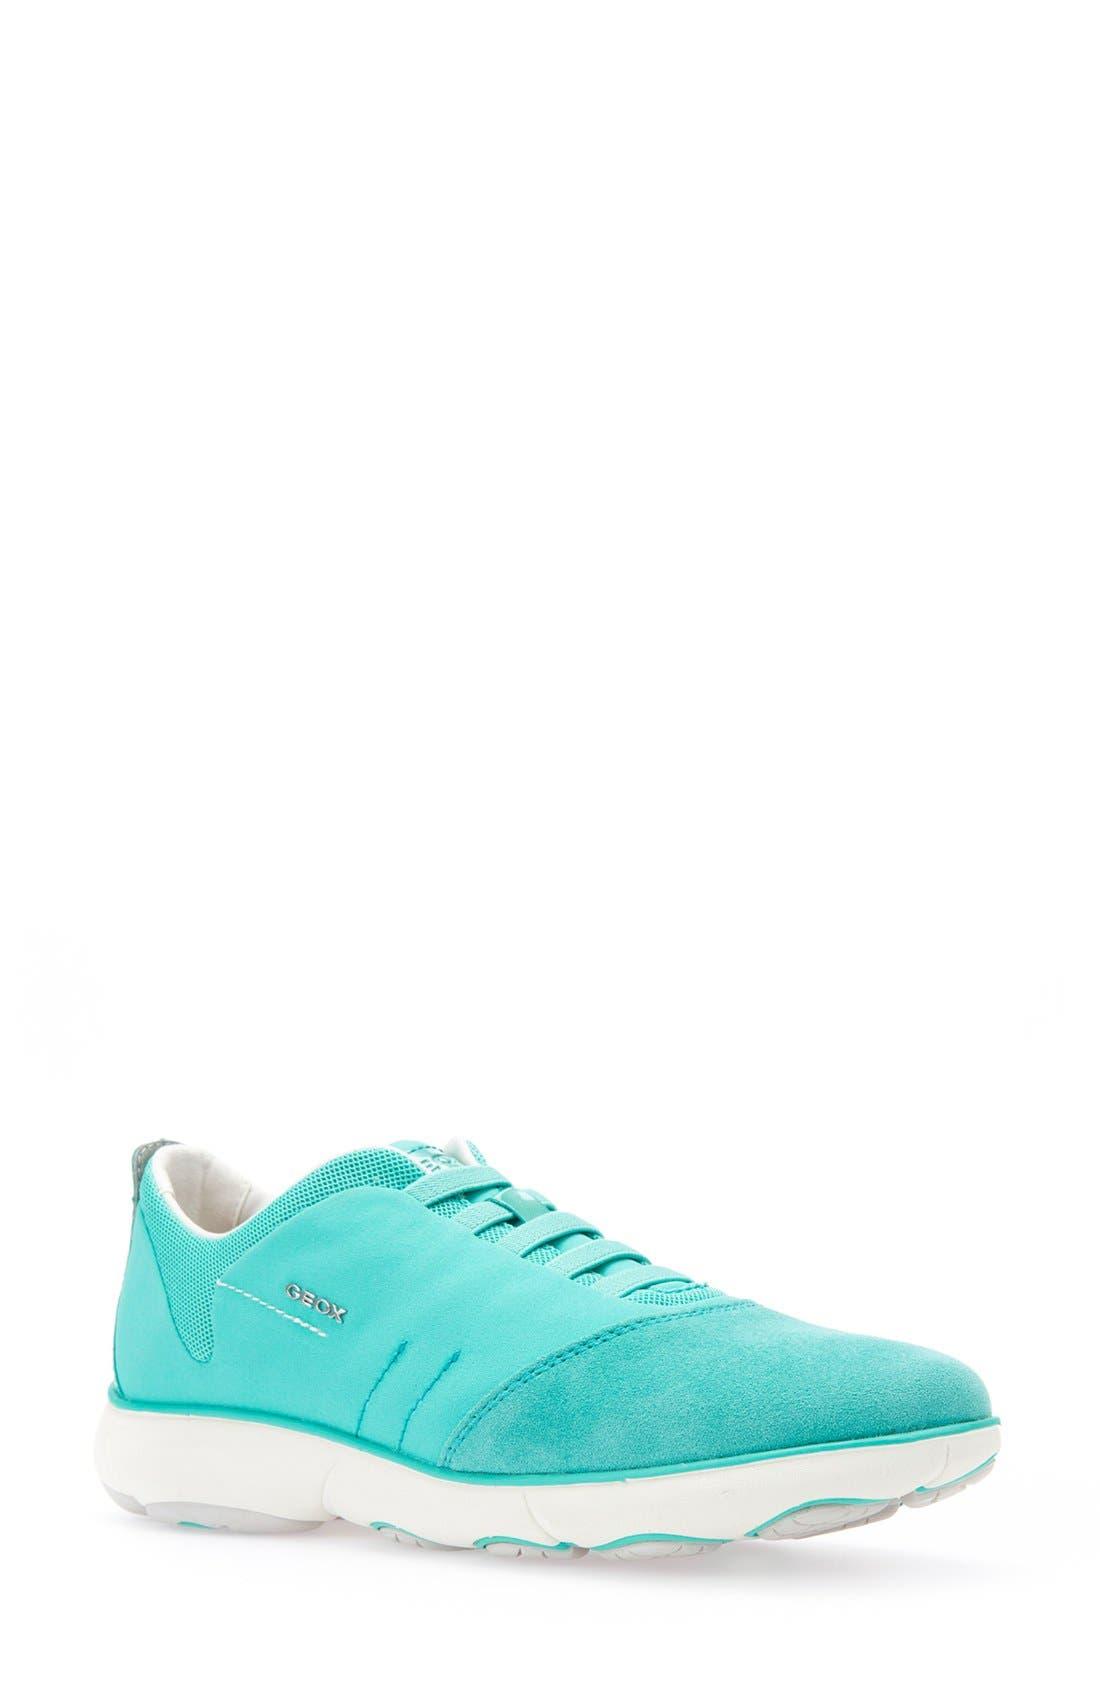 Nebula Sneaker,                             Main thumbnail 1, color,                             Sea Water Blue